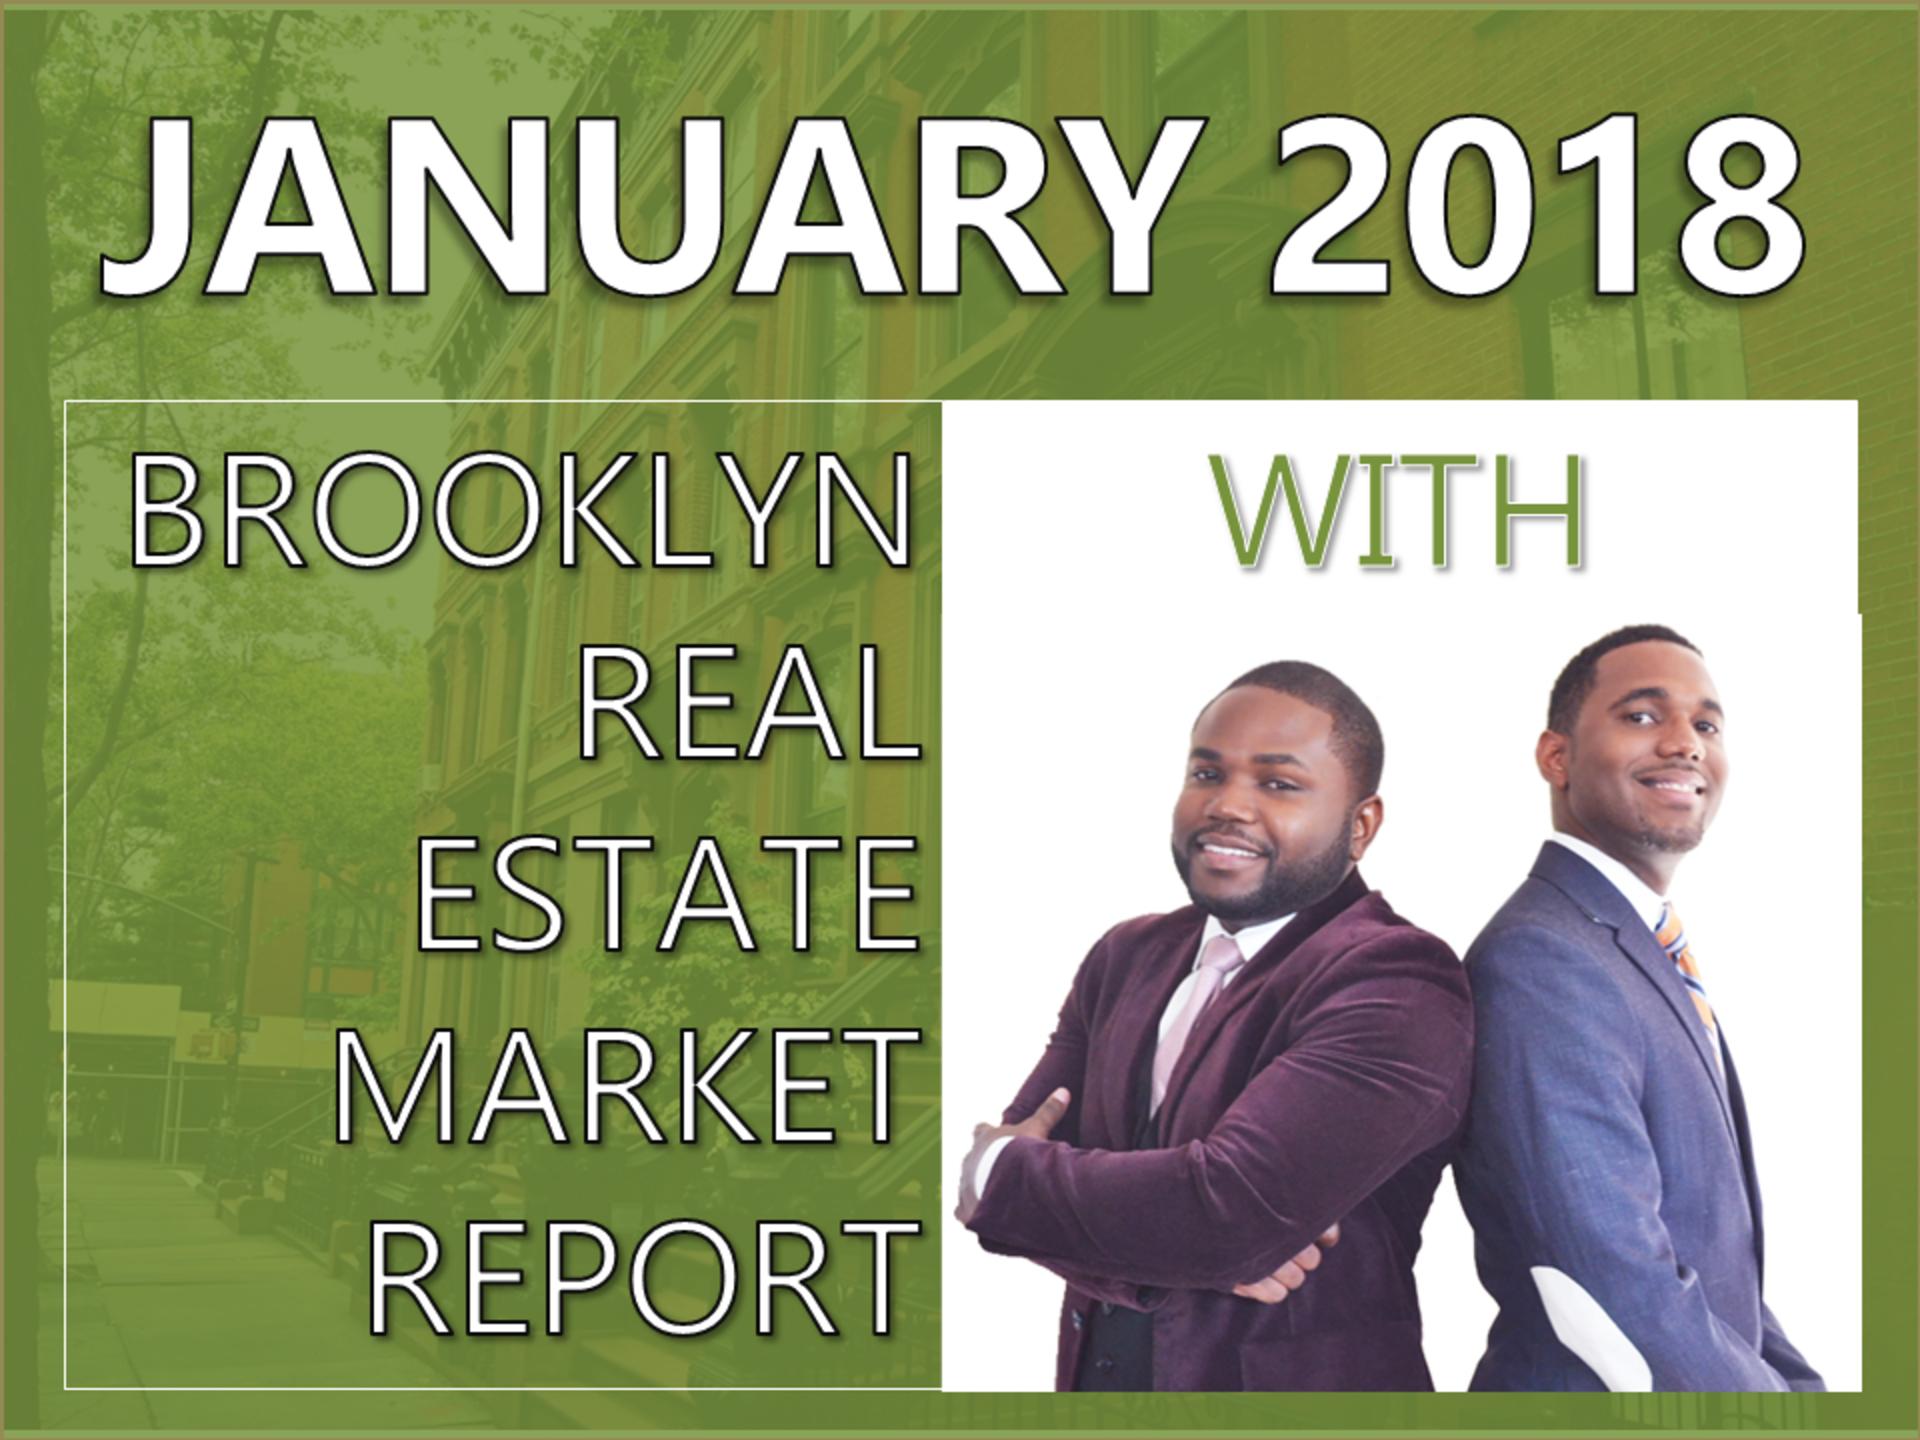 January 2018 Brooklyn Real Estate Market Report